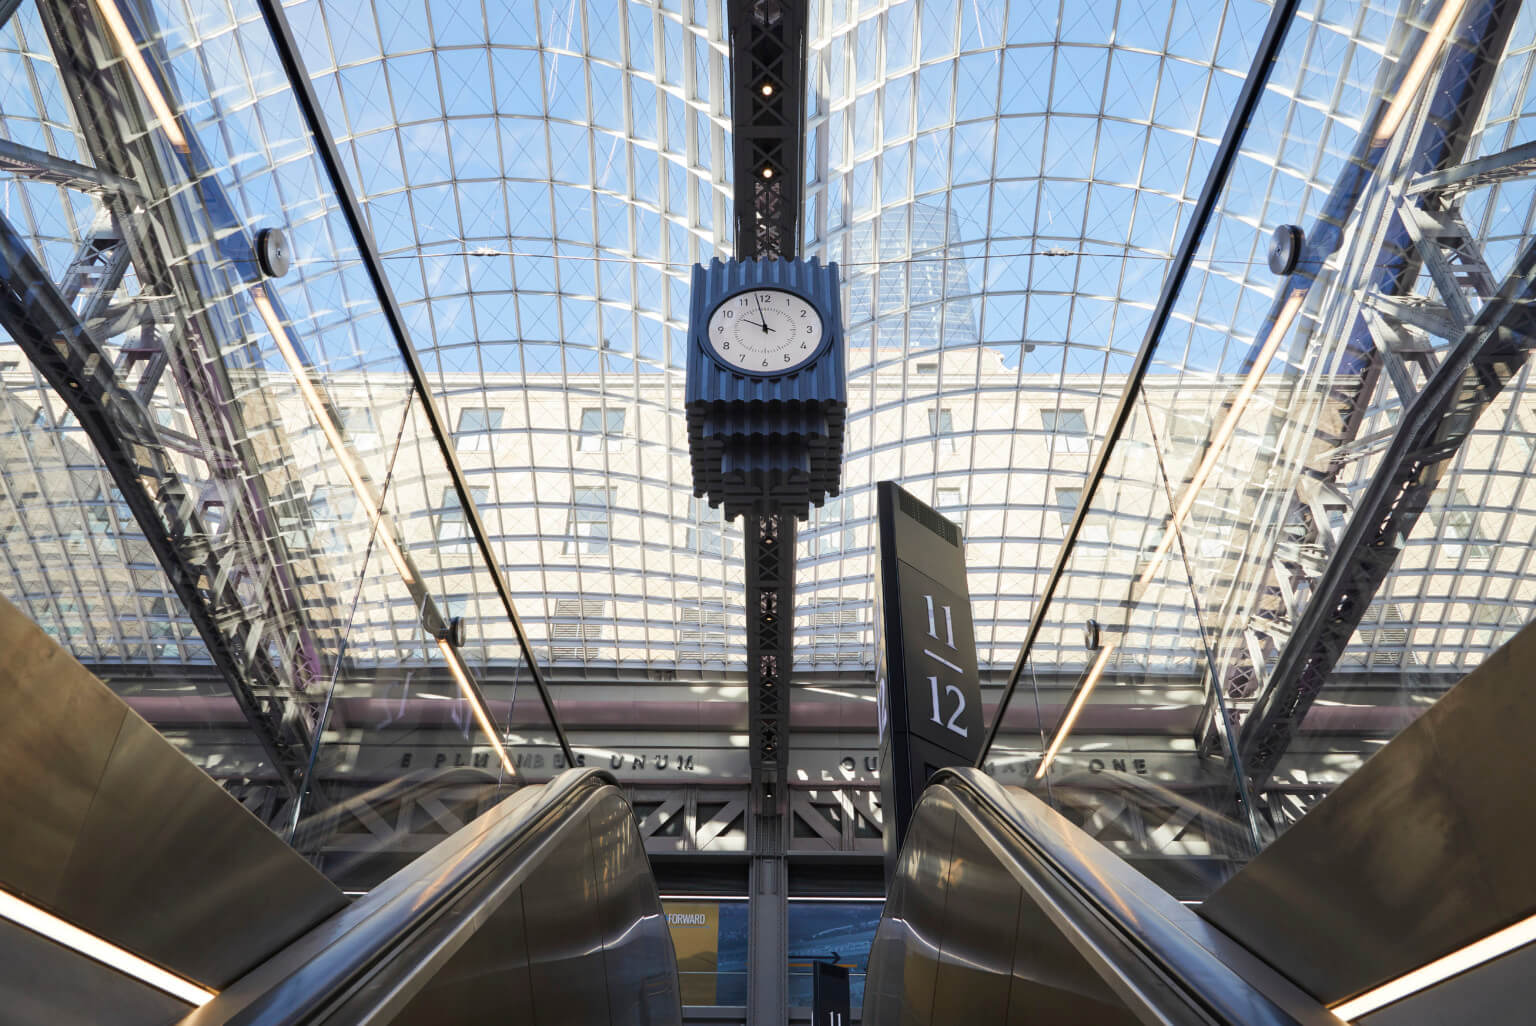 xMoynihan-Train-Hall_Lucas-Blair-Simpson_SOM_08_jpg-1536x1026.jpg.pagespeed.ic.5VlqYB-TUP